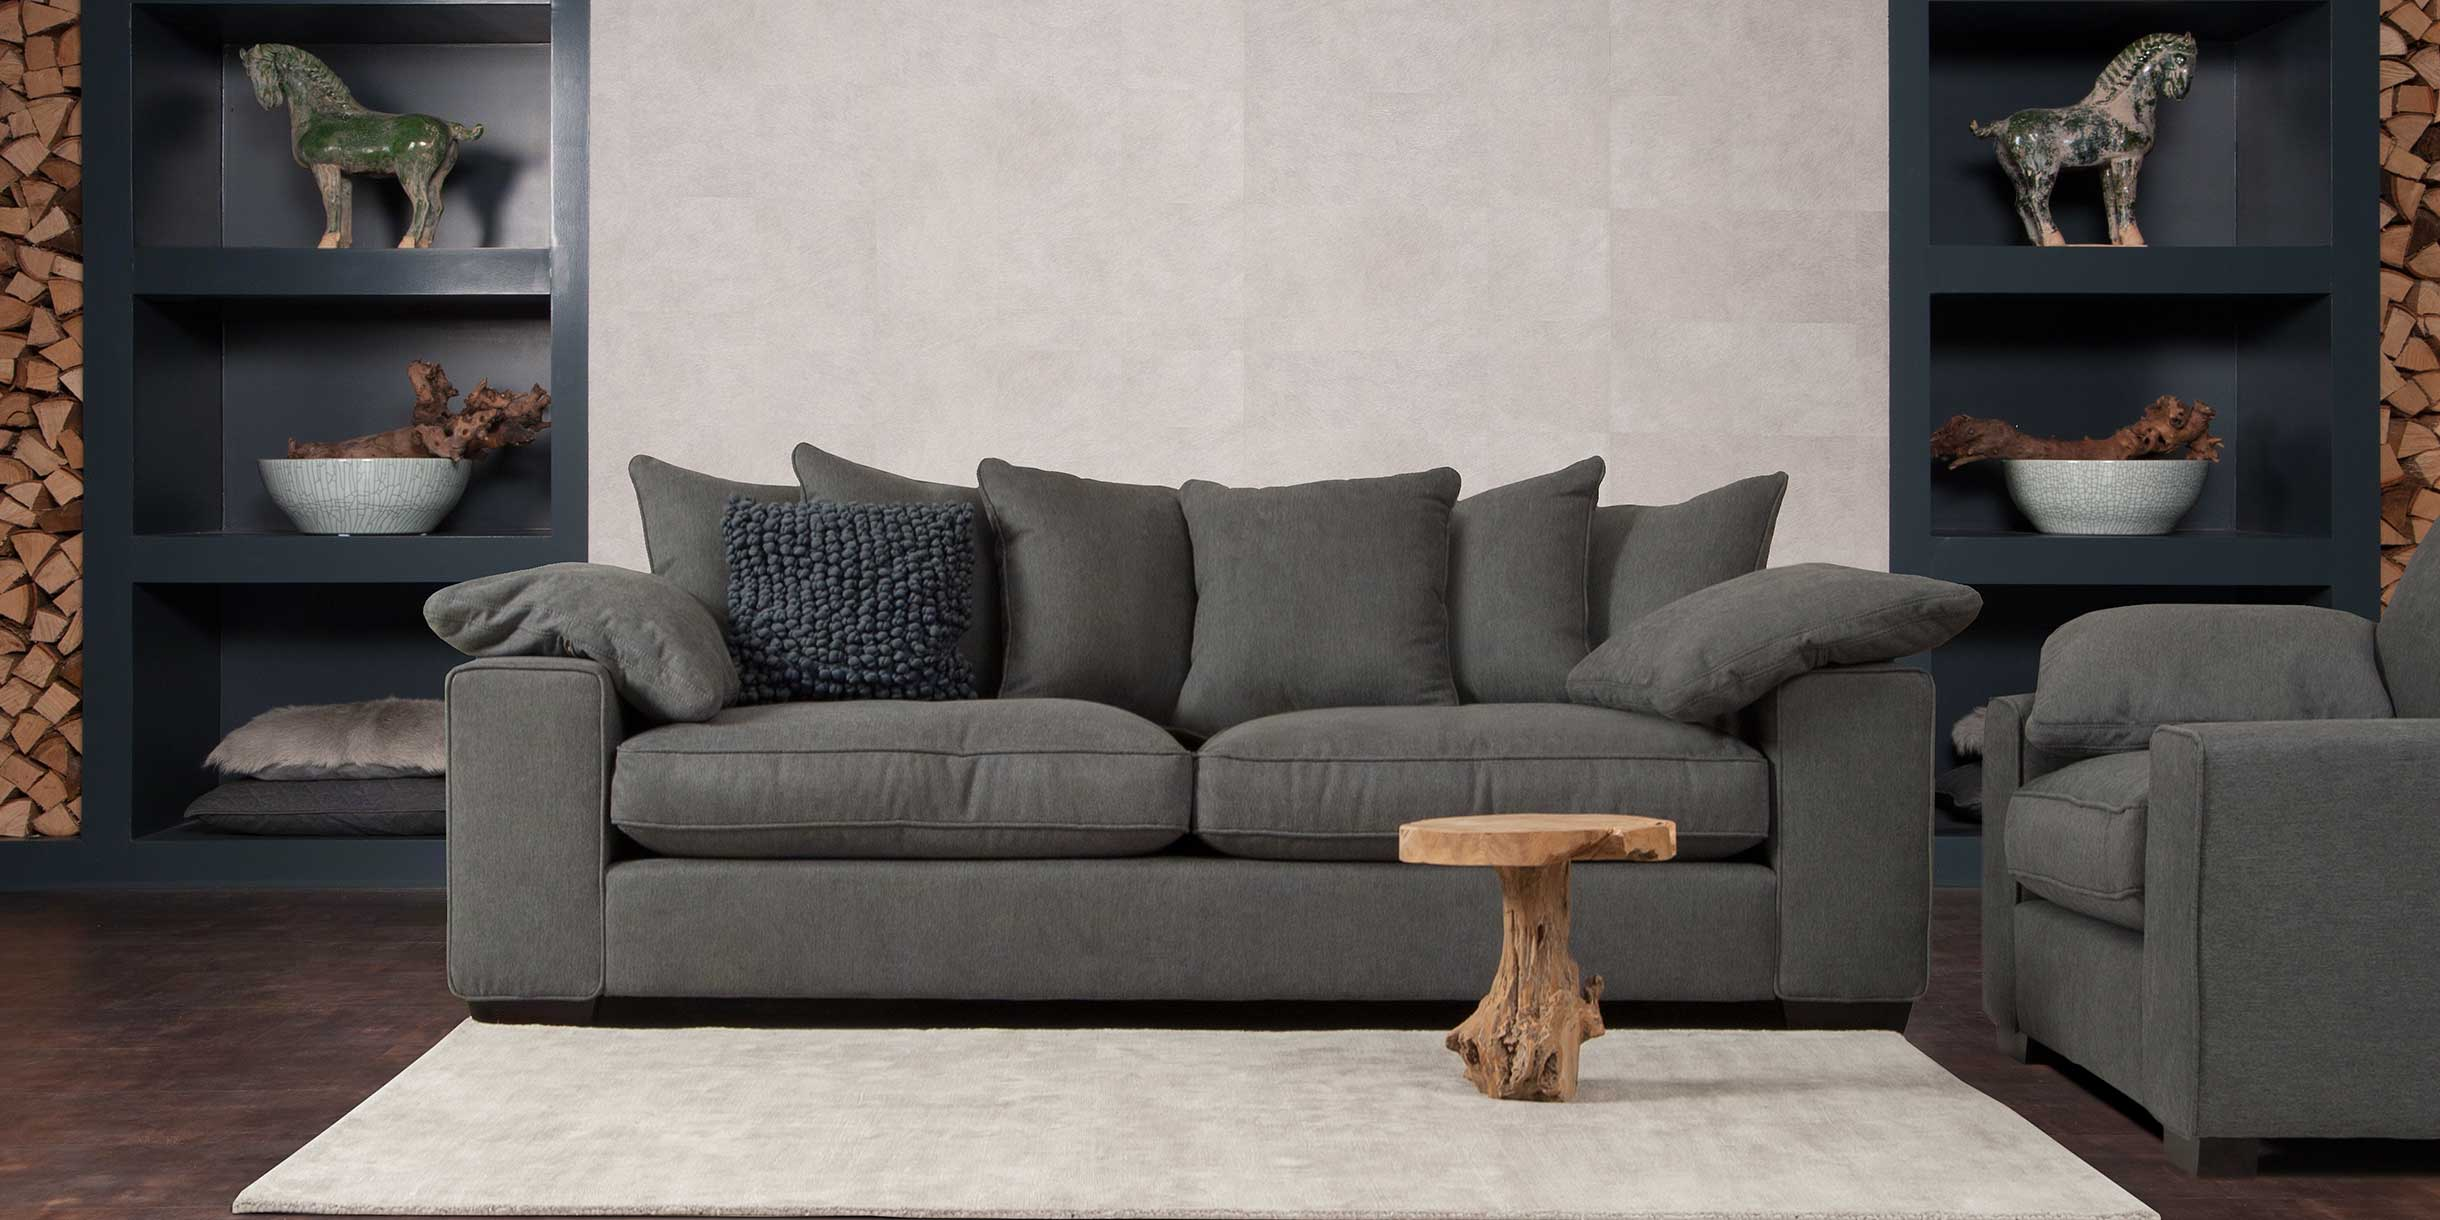 UrbanSofa-Firenca-Sofa-Vintage